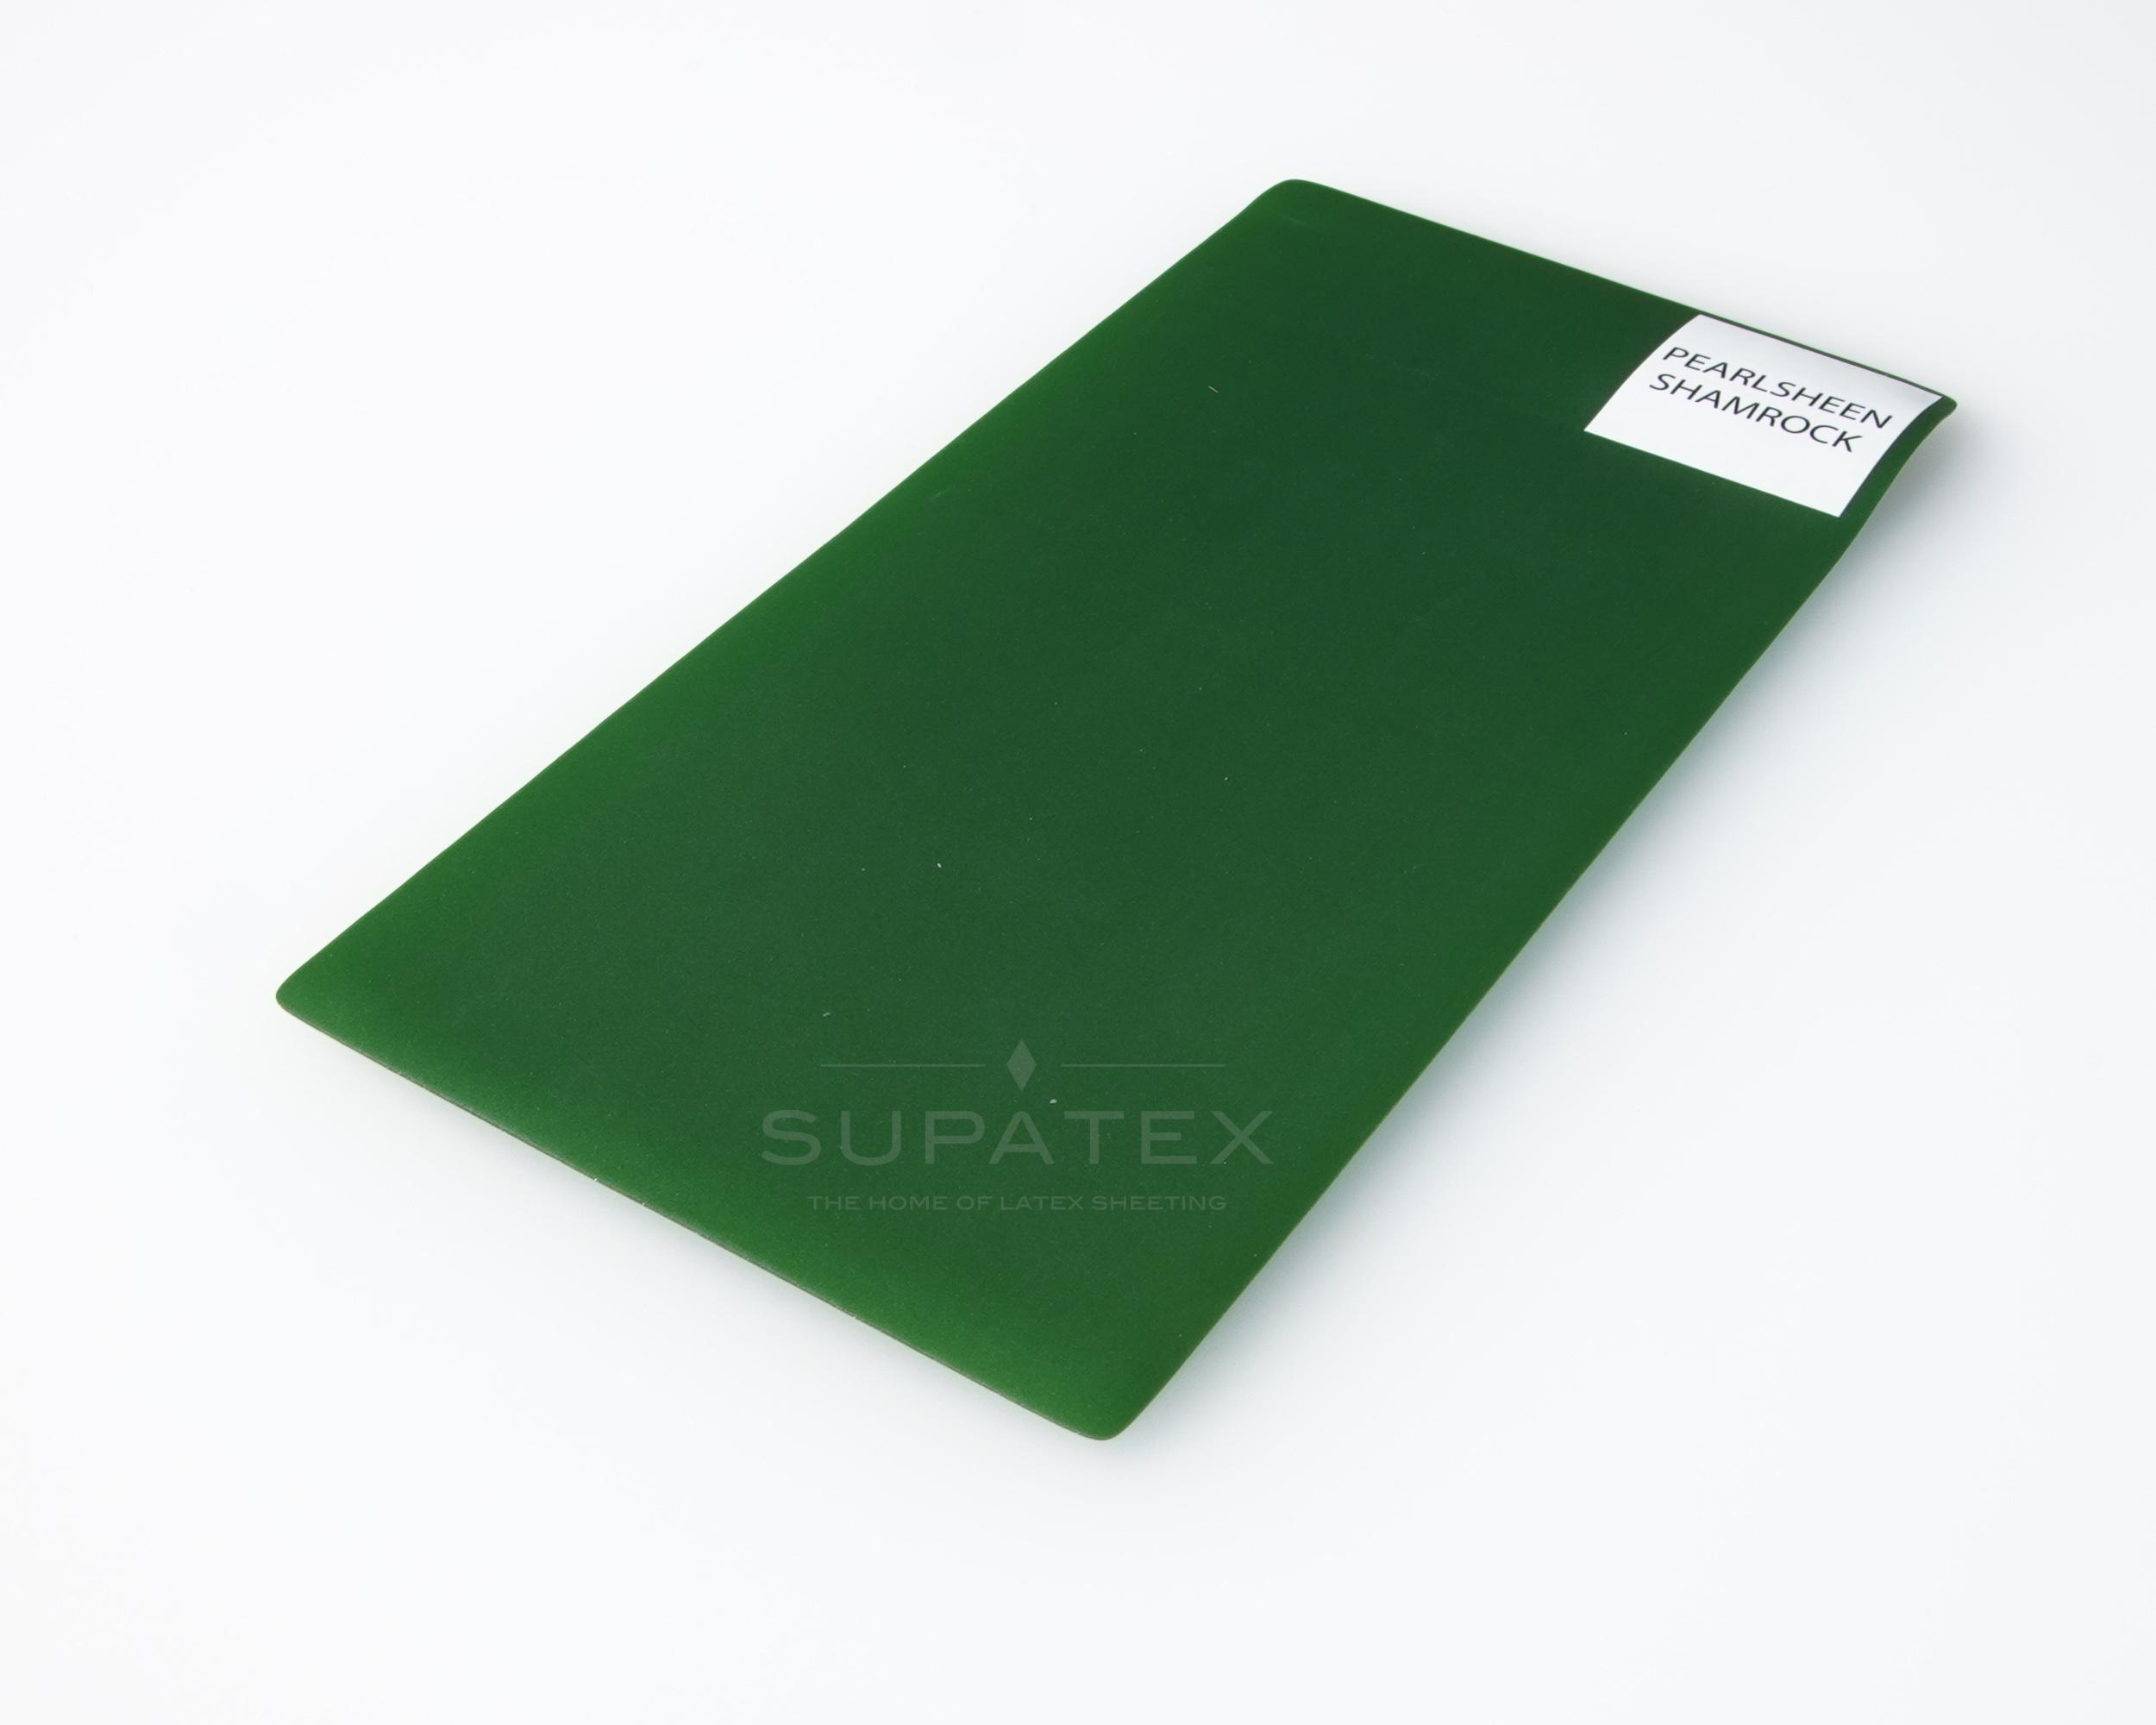 Supatex Pearlsheen Shamrock 0.33 mm